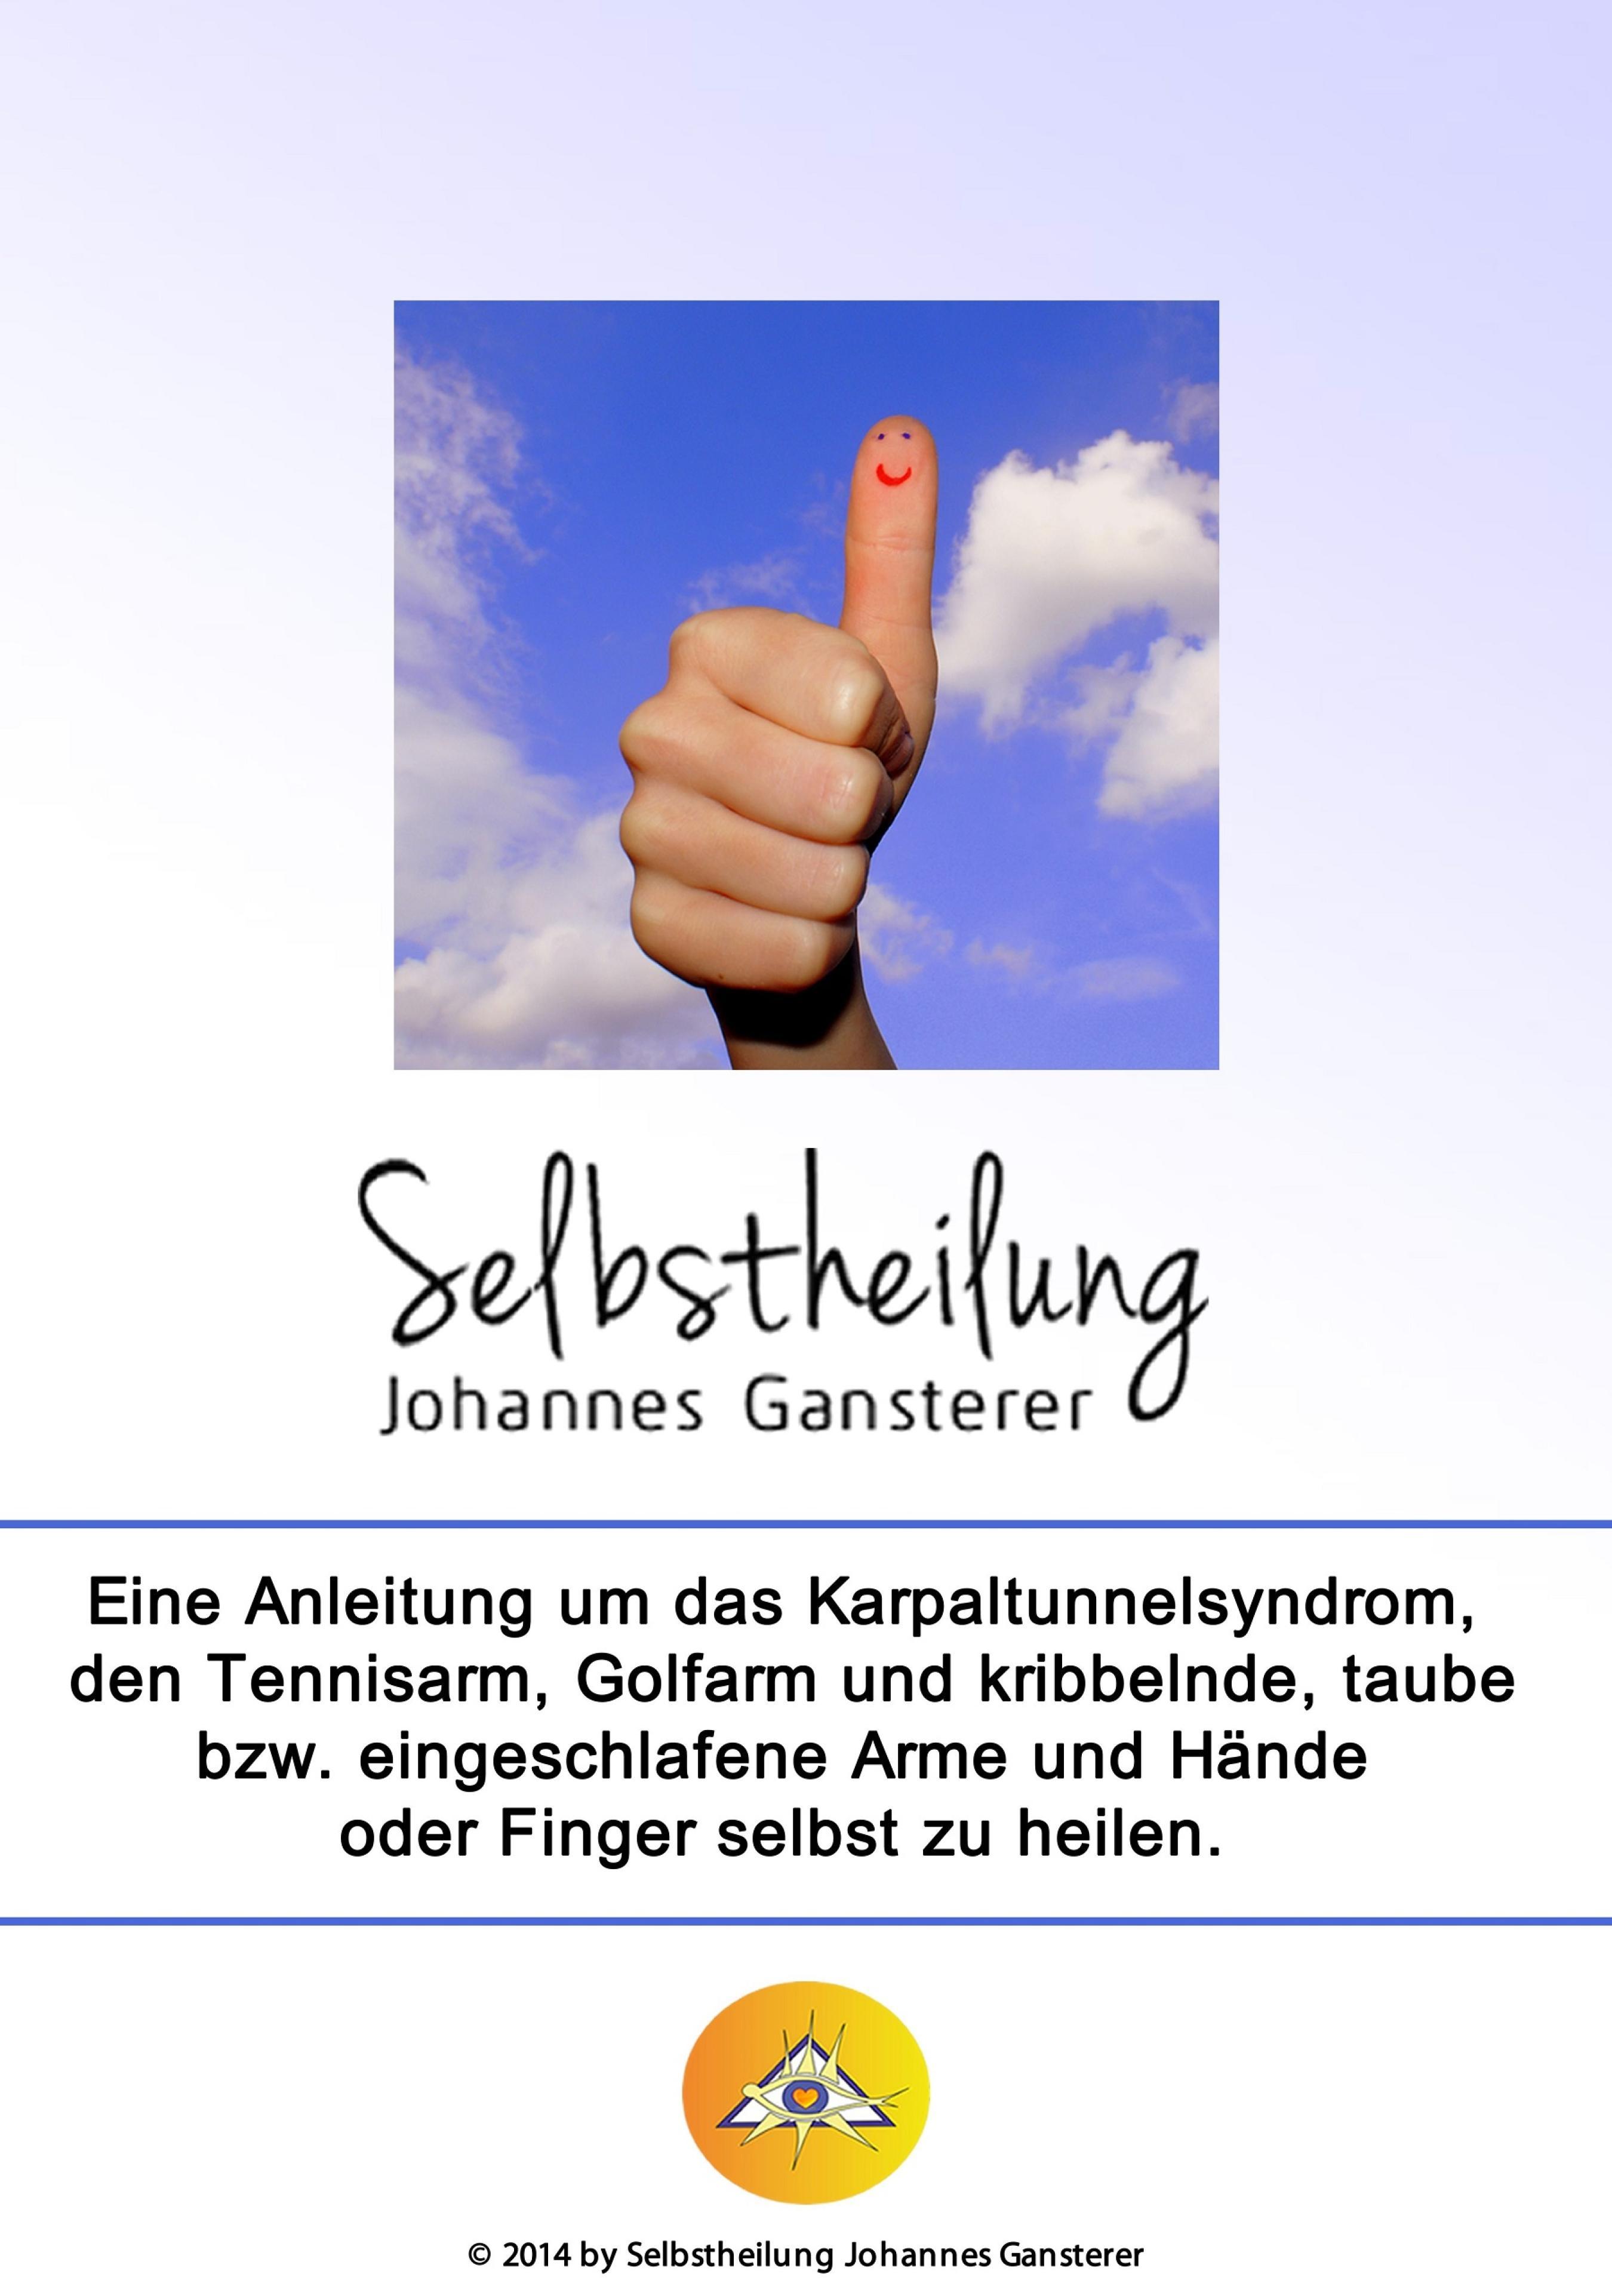 Johannes Gansterer Selbstheilung johannes schweikle ausreißversuch